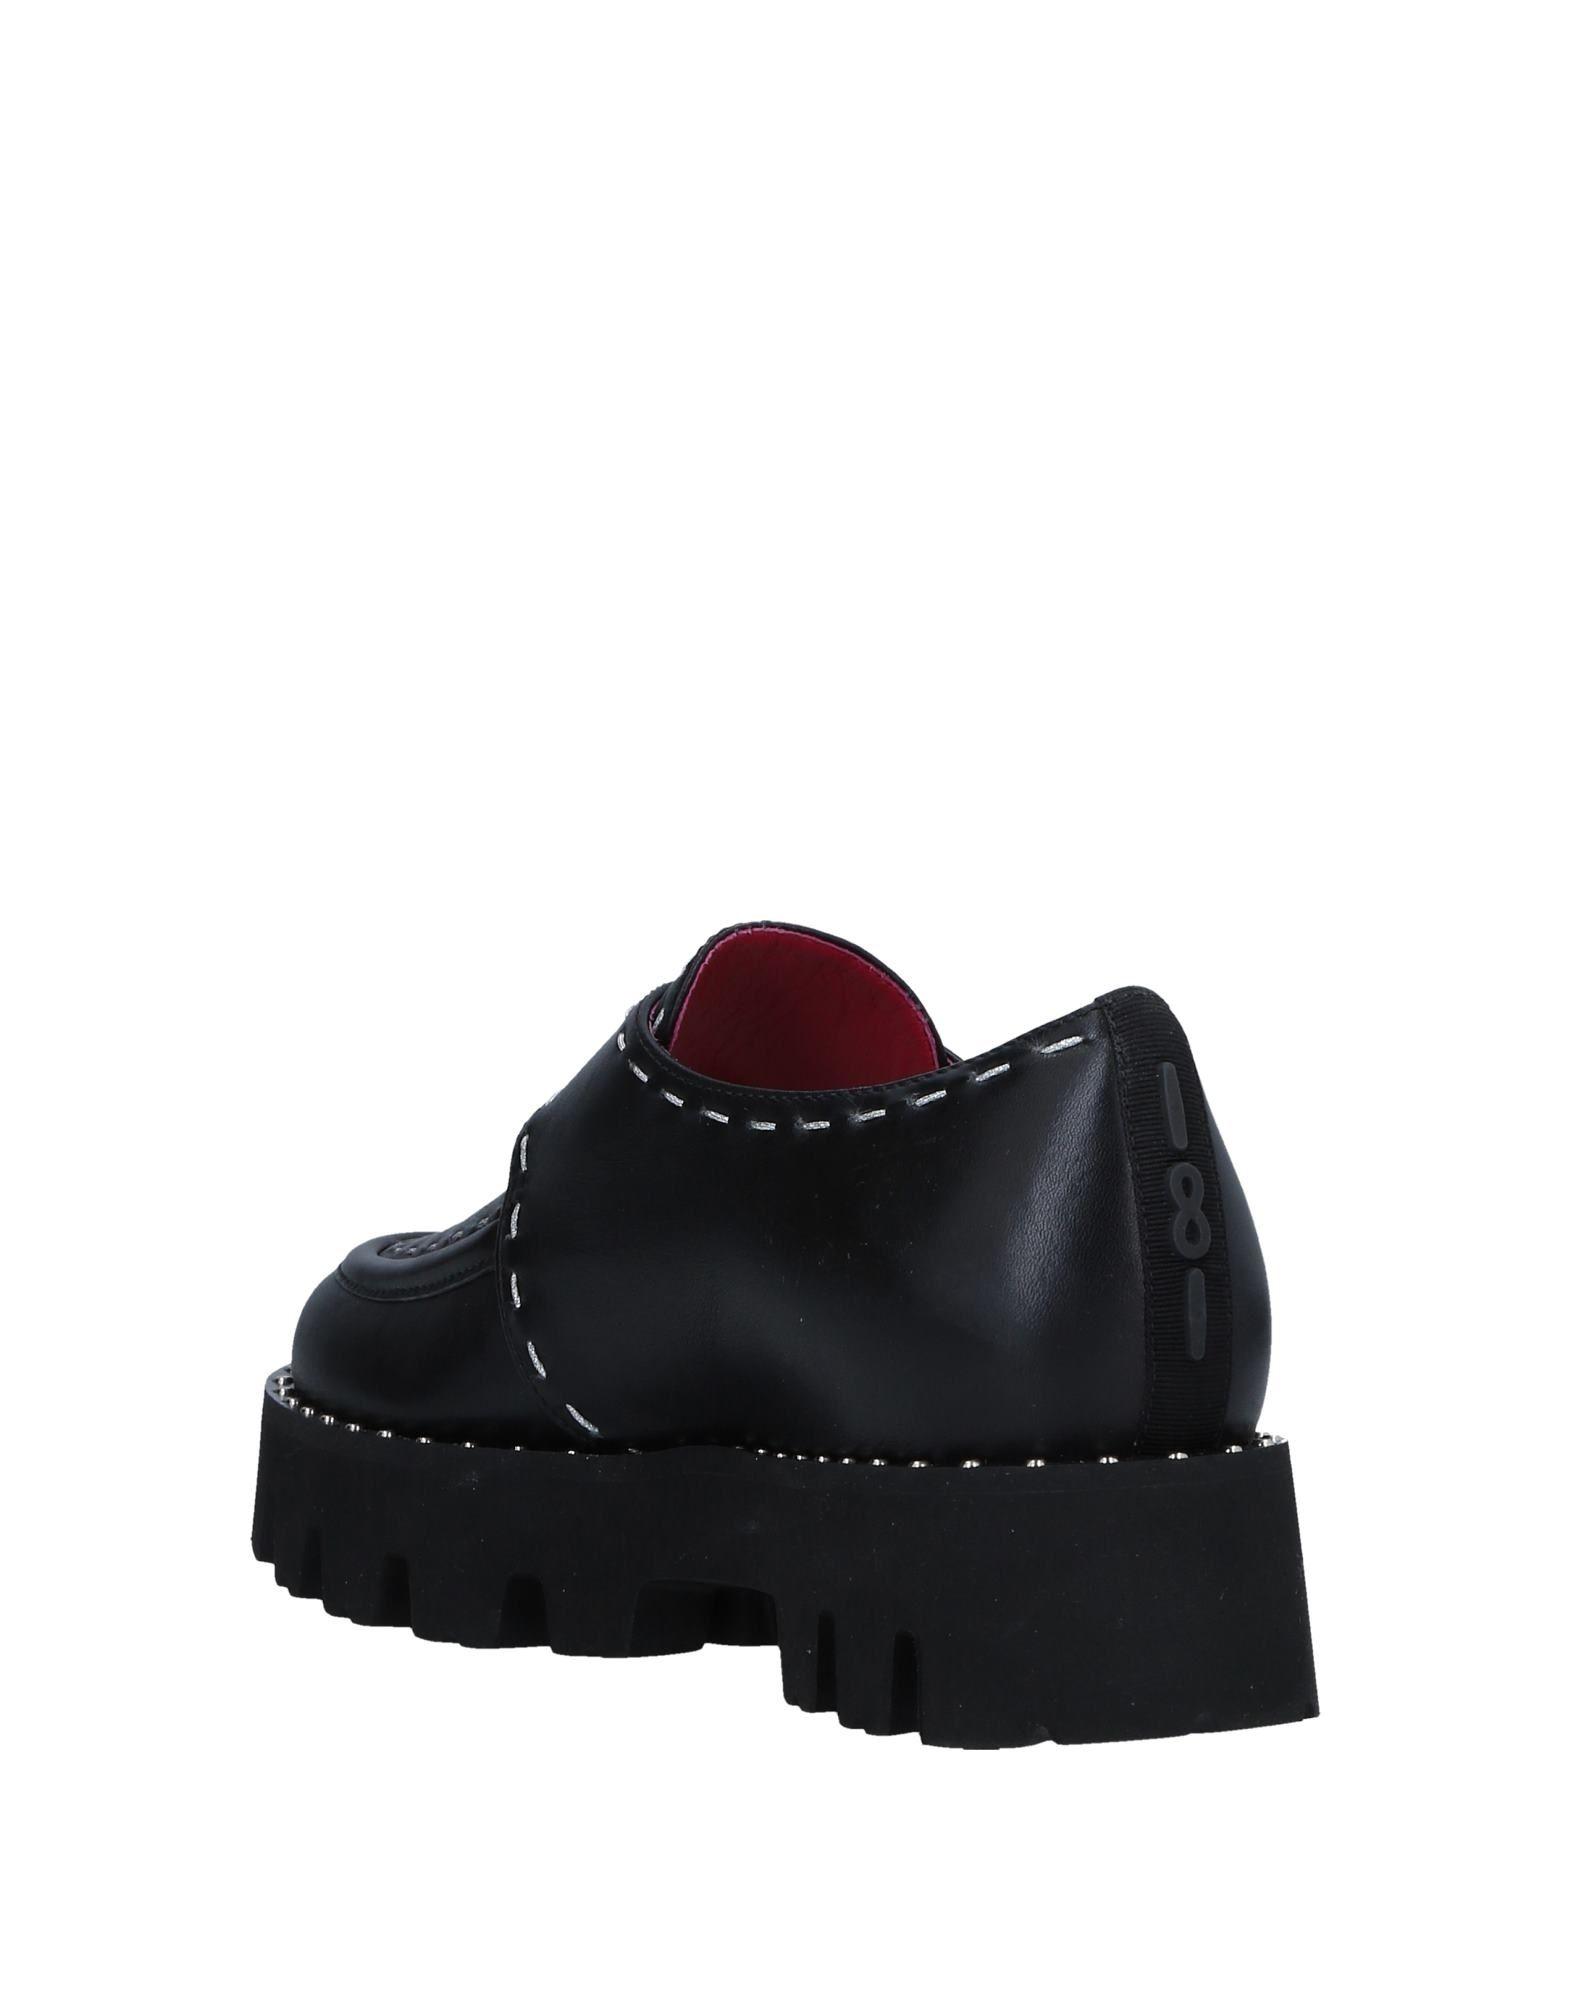 Stilvolle billige Schuhe Schnürschuhe 181 By Alberto Gozzi Schnürschuhe Schuhe Damen  11536236MP 536b45